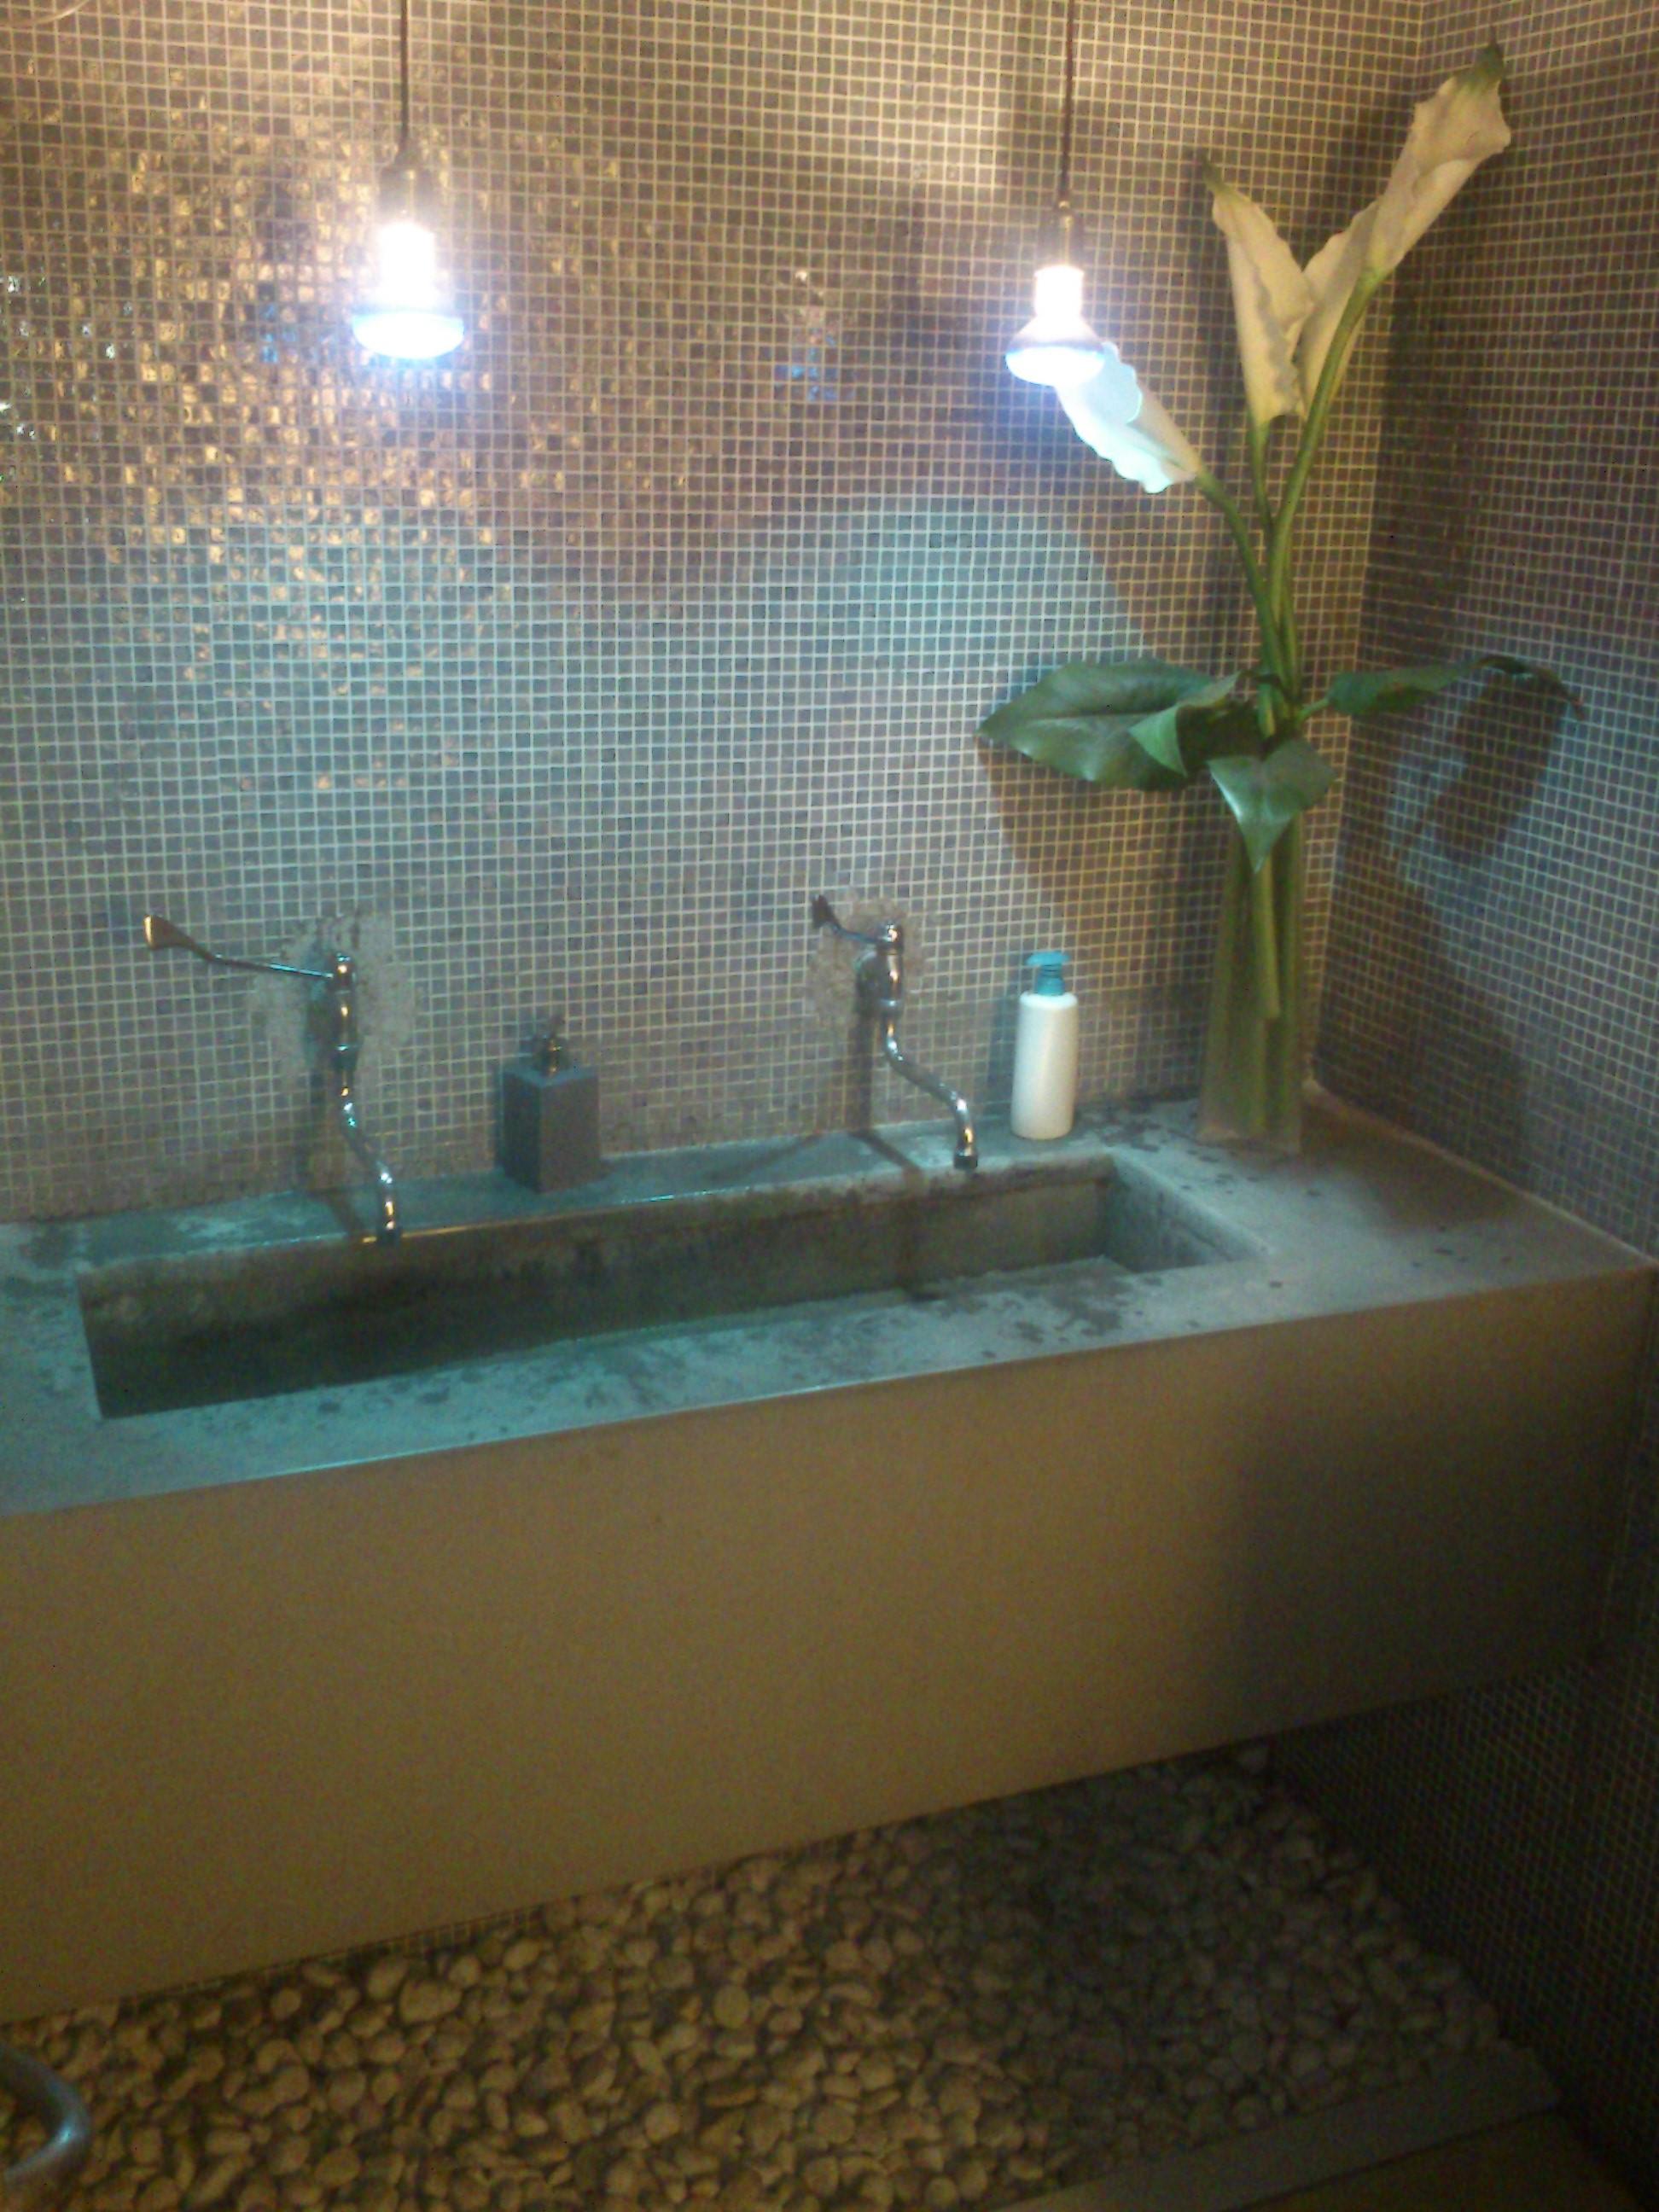 Residential bathroom renovation, Sai Kung